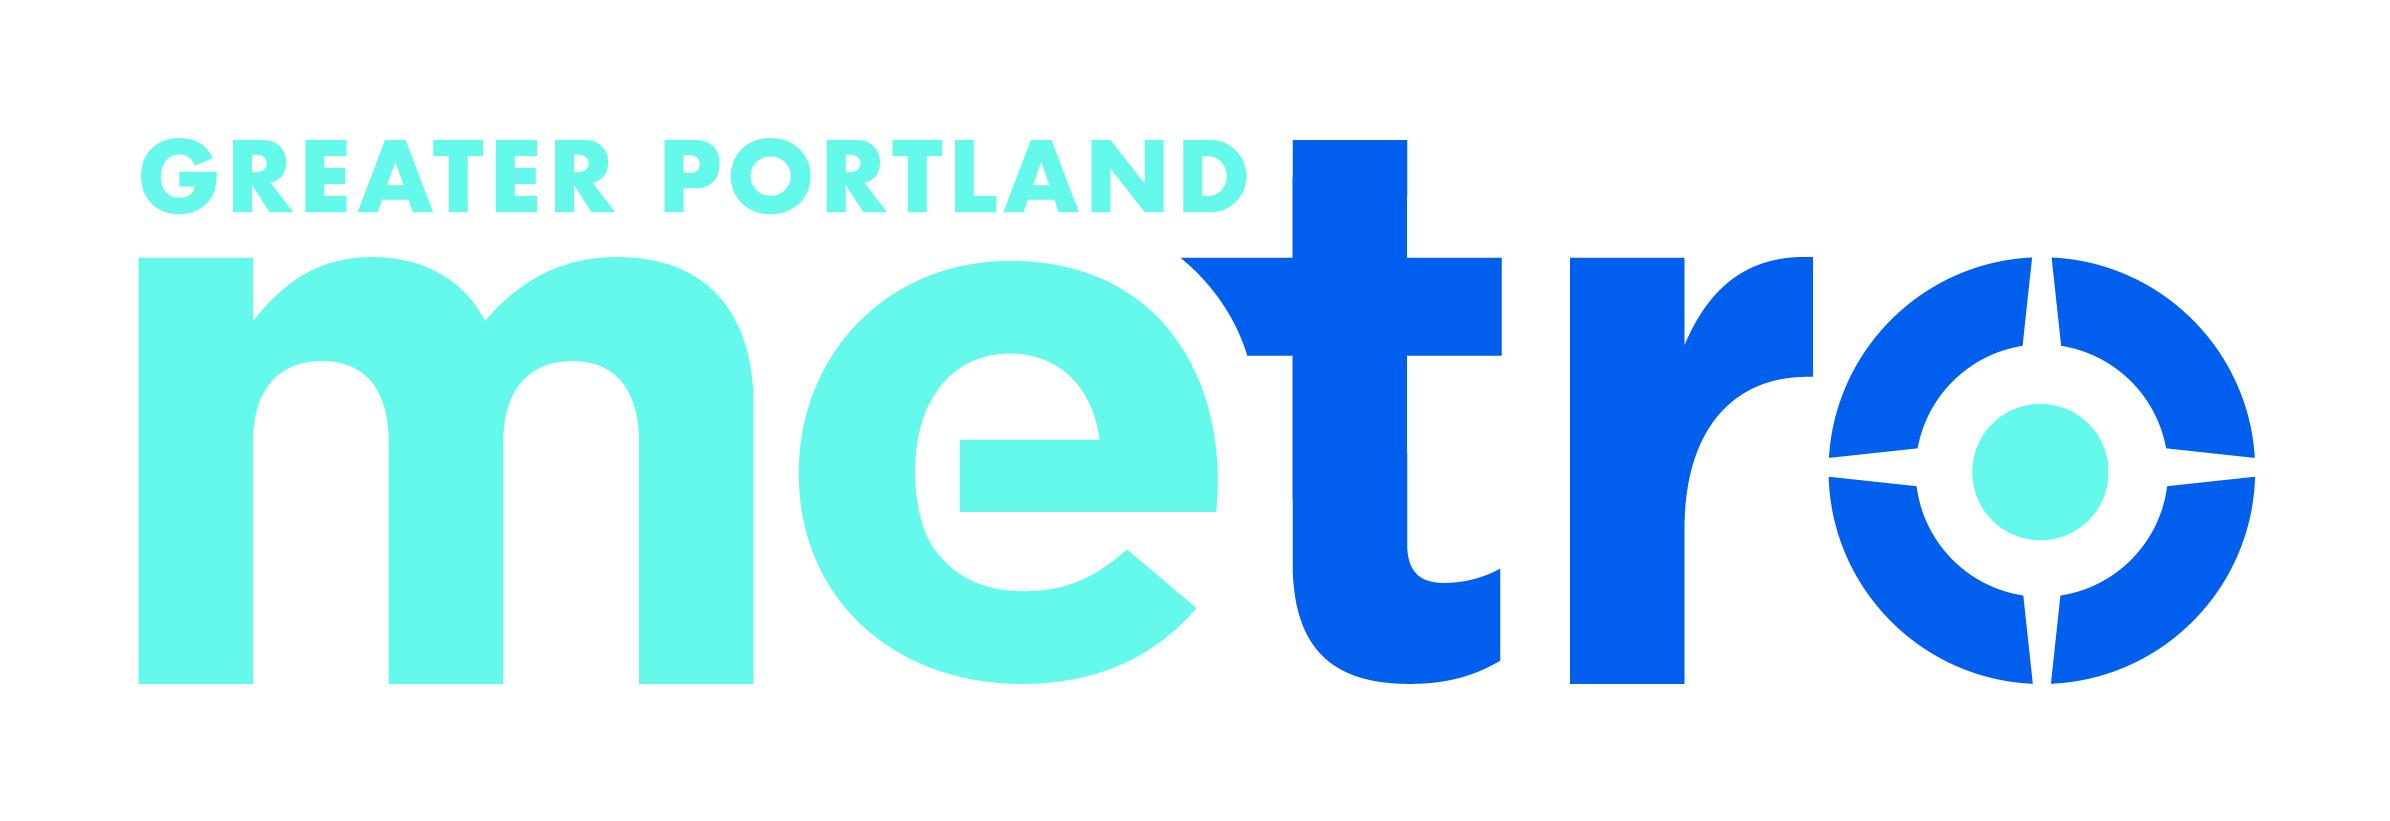 Greater Portland METRO